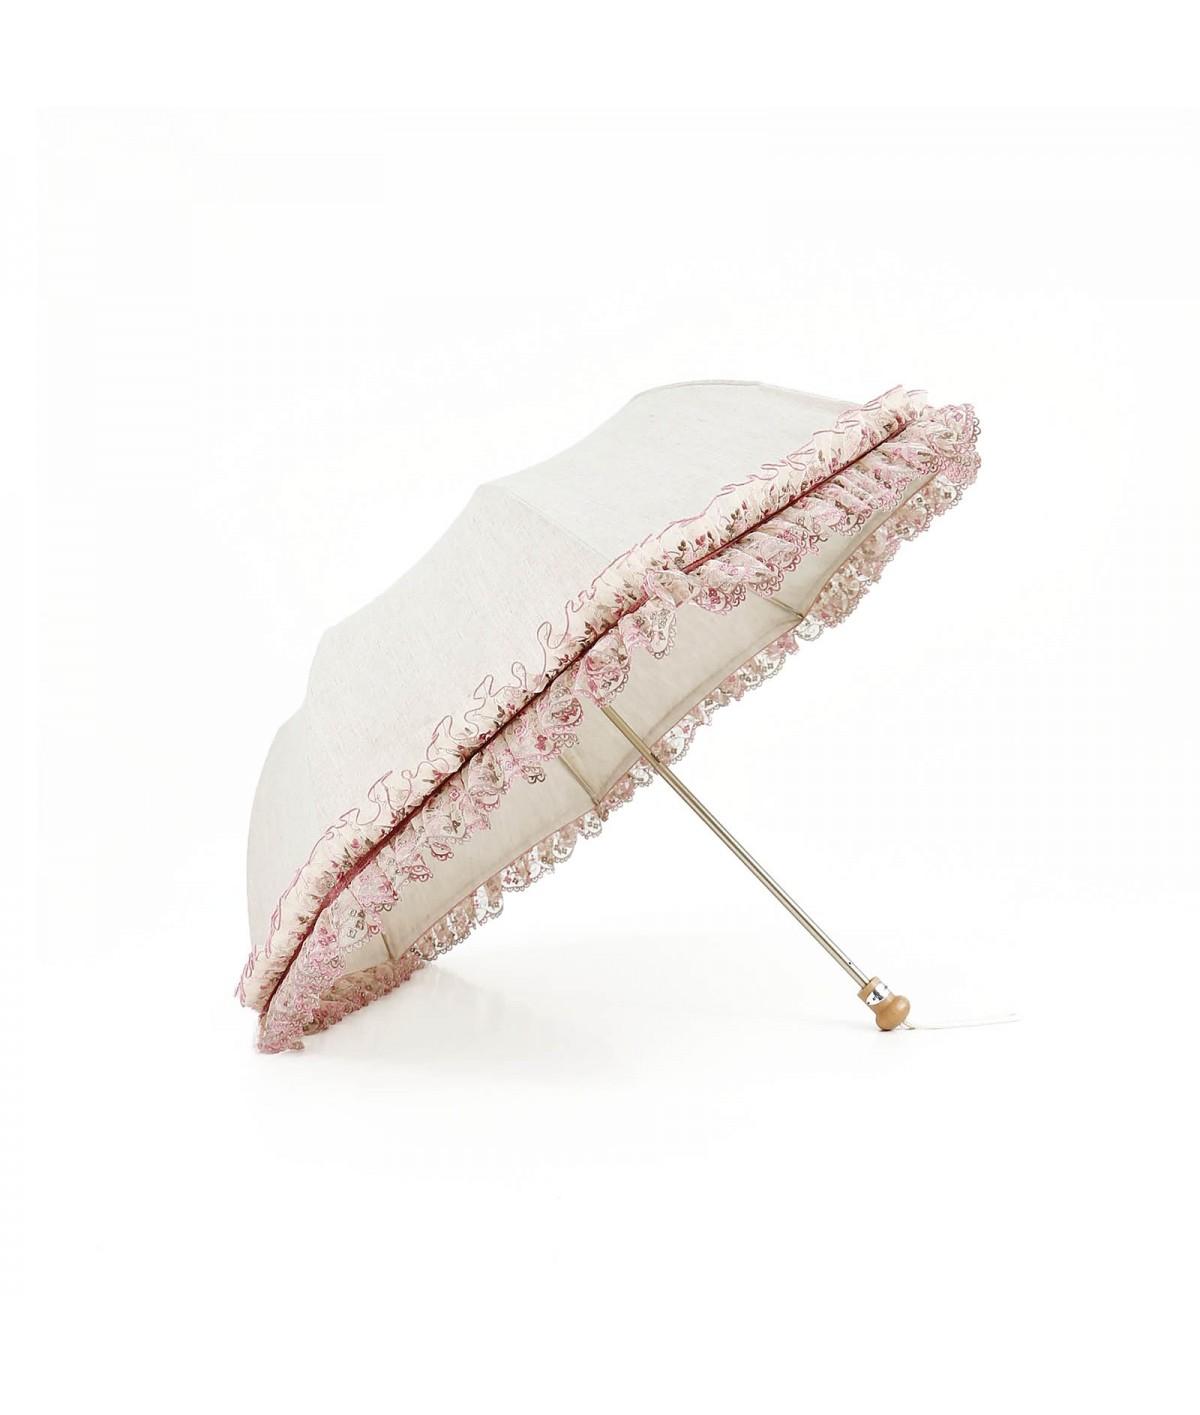 Ombrelle froufrou pliante